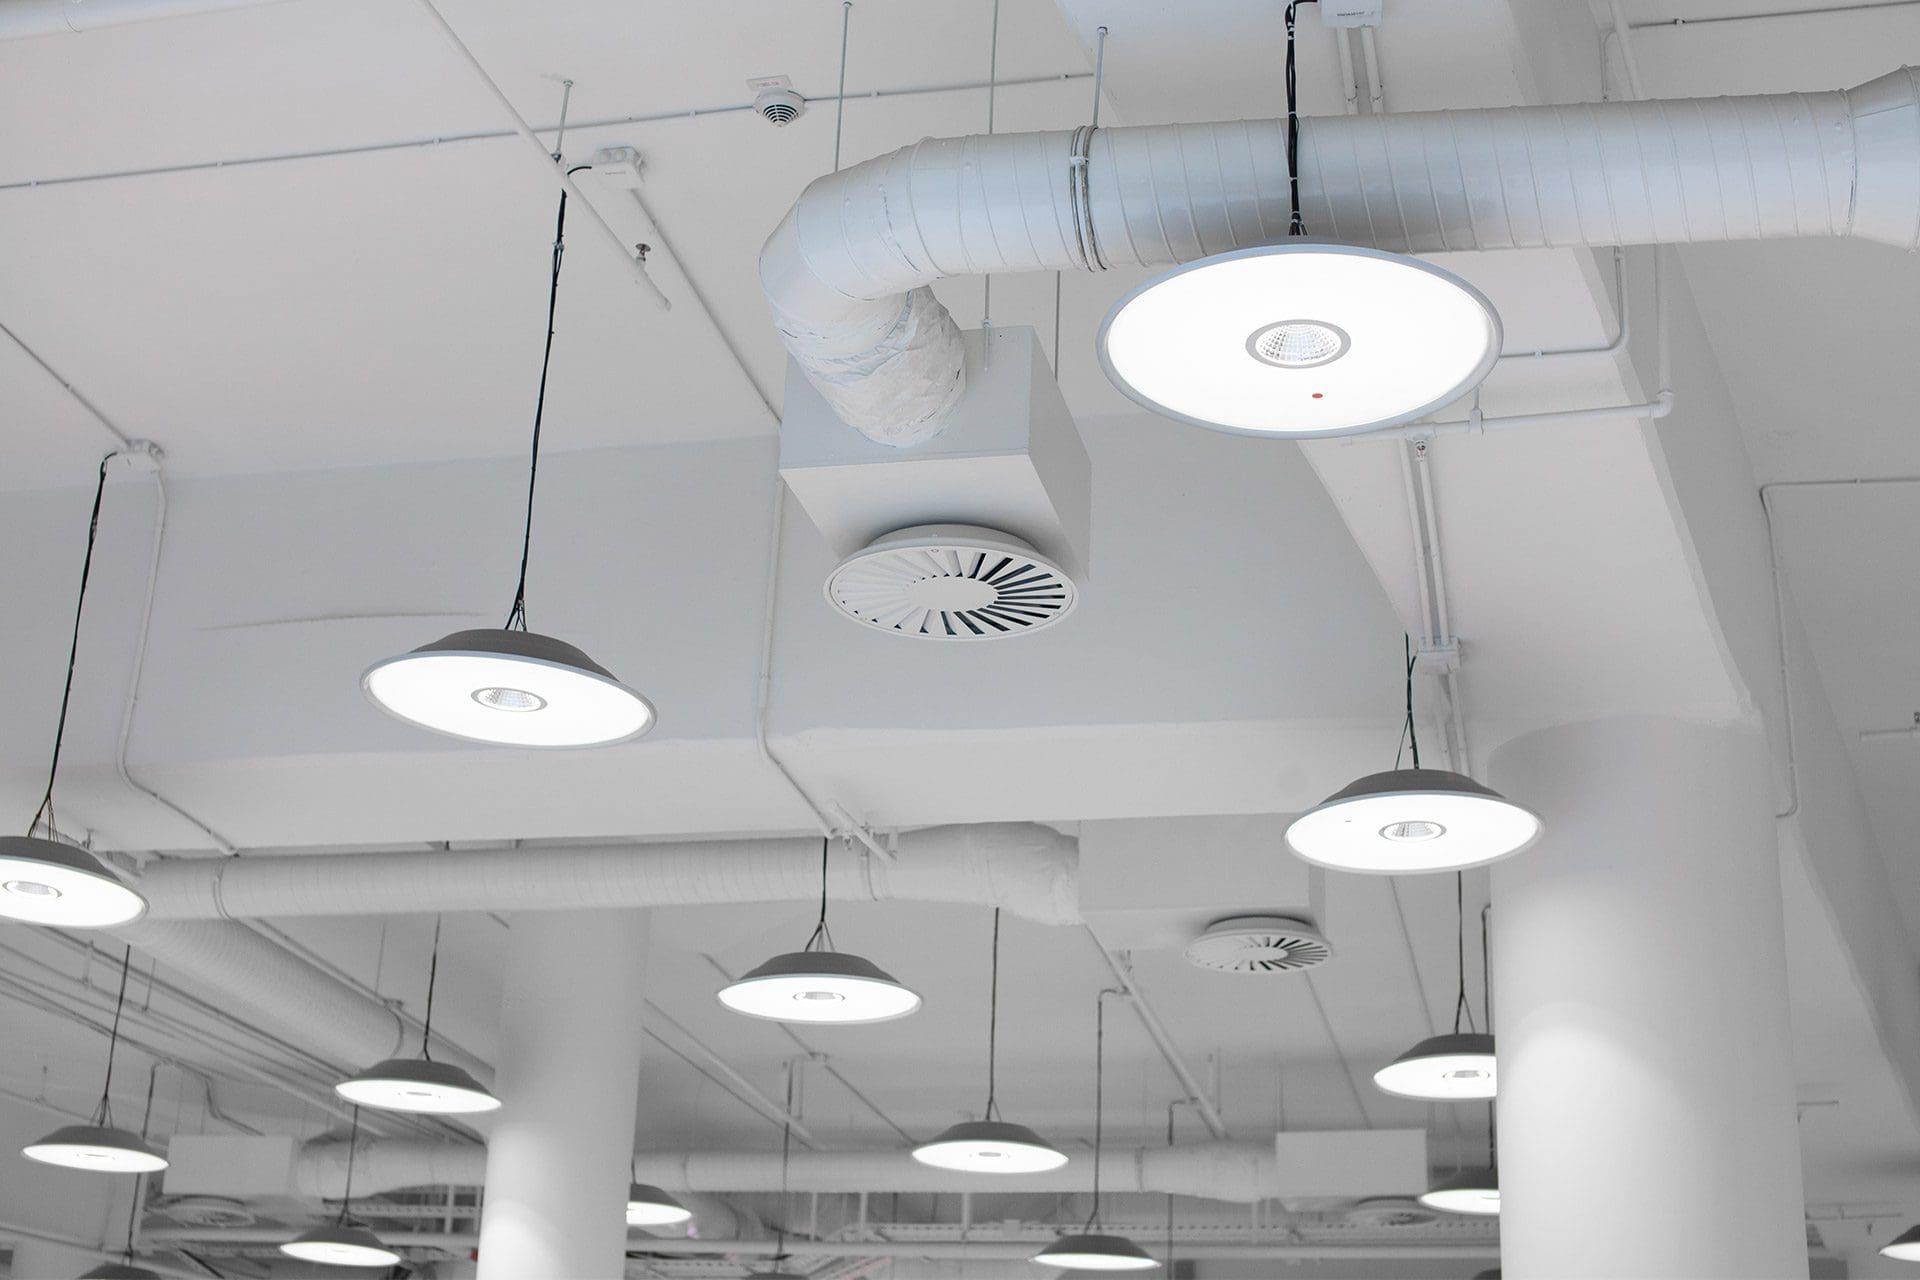 Overhead lights and HVAC